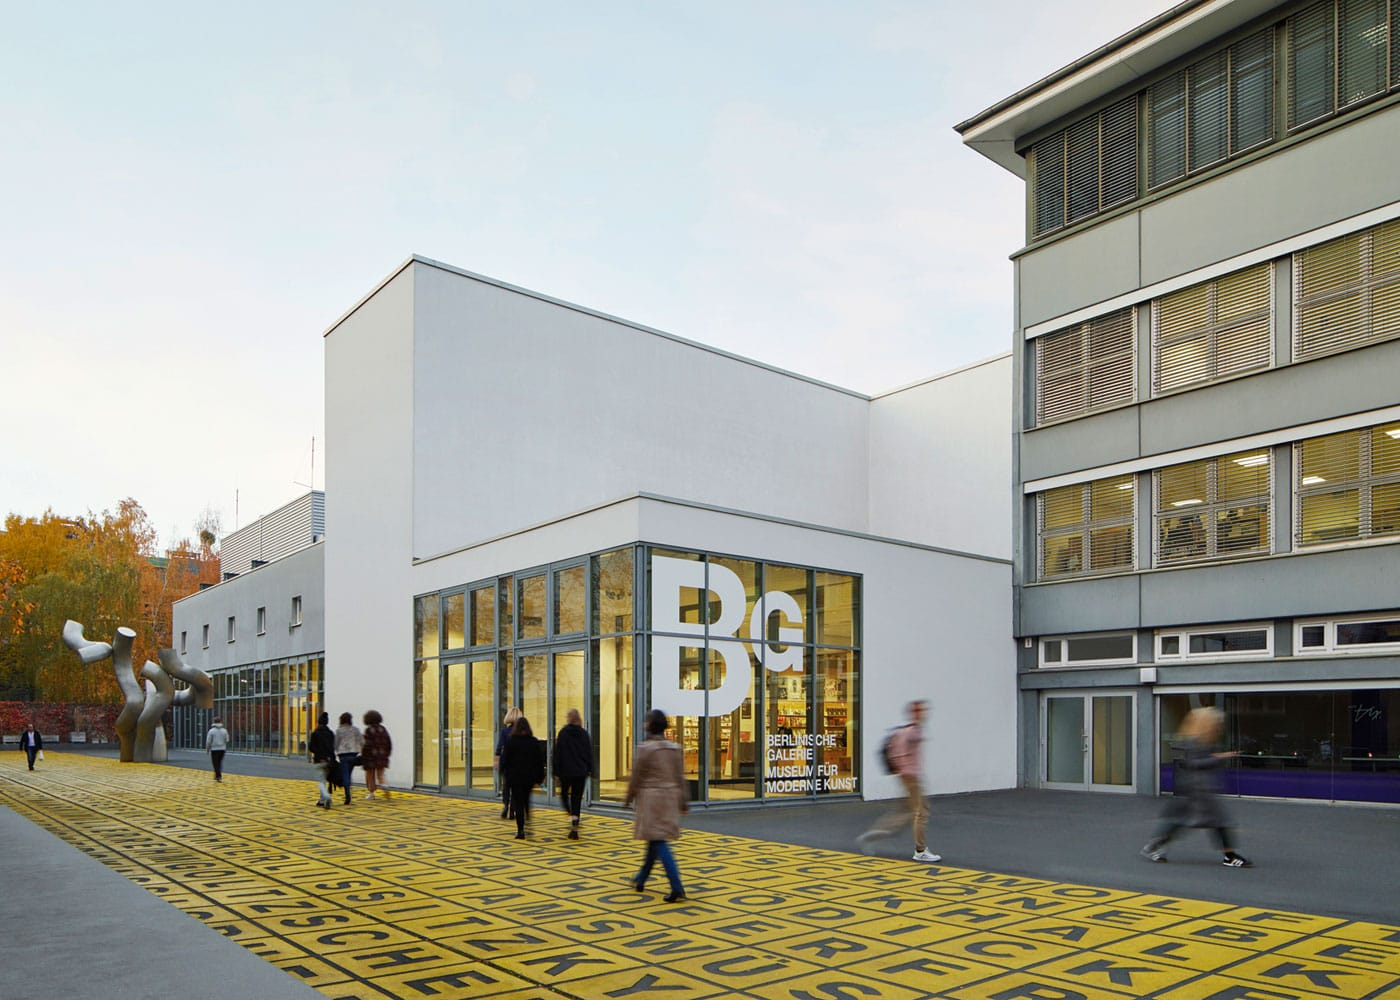 Digitale Angebote der Berlinischen Galerie – Museum für moderne Kunst in Berlin // HIMBEER